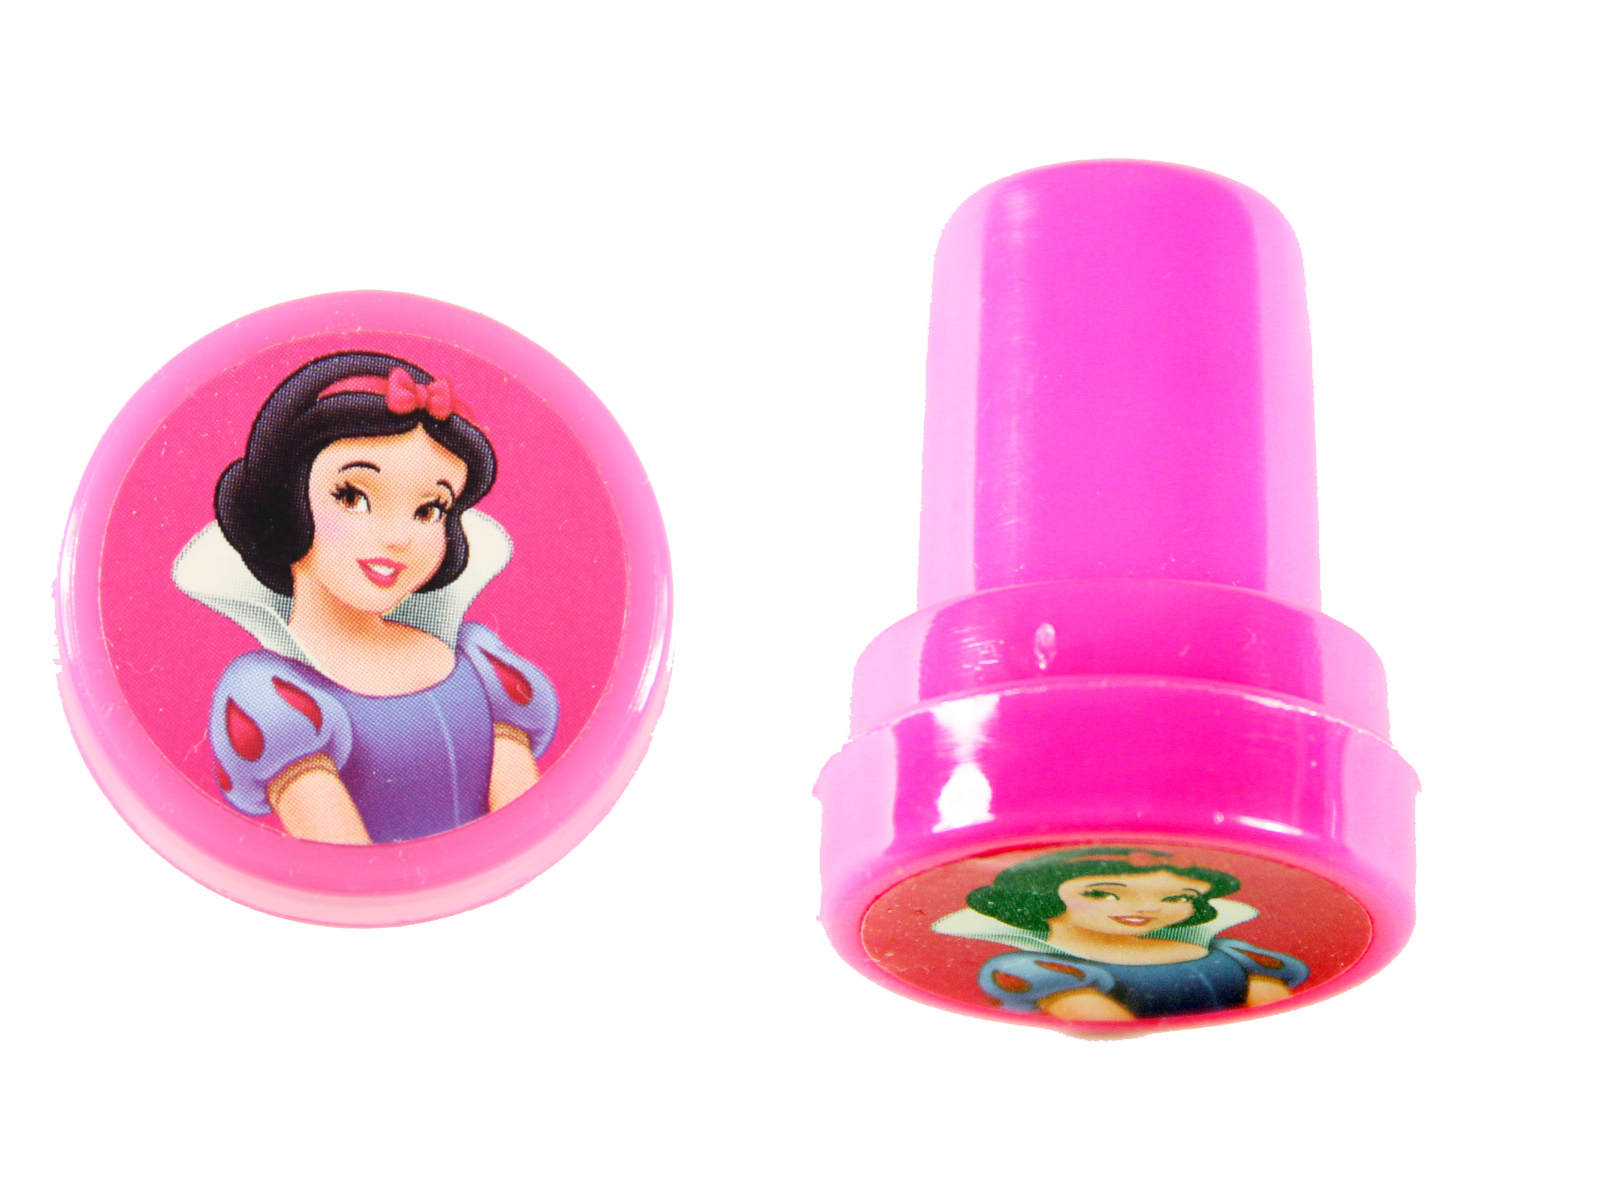 Jual Mainan Stempel Tinta Reward Kids Inked Stamp Princess Snow White St027 Pusat Barang Unik China Tokopedia